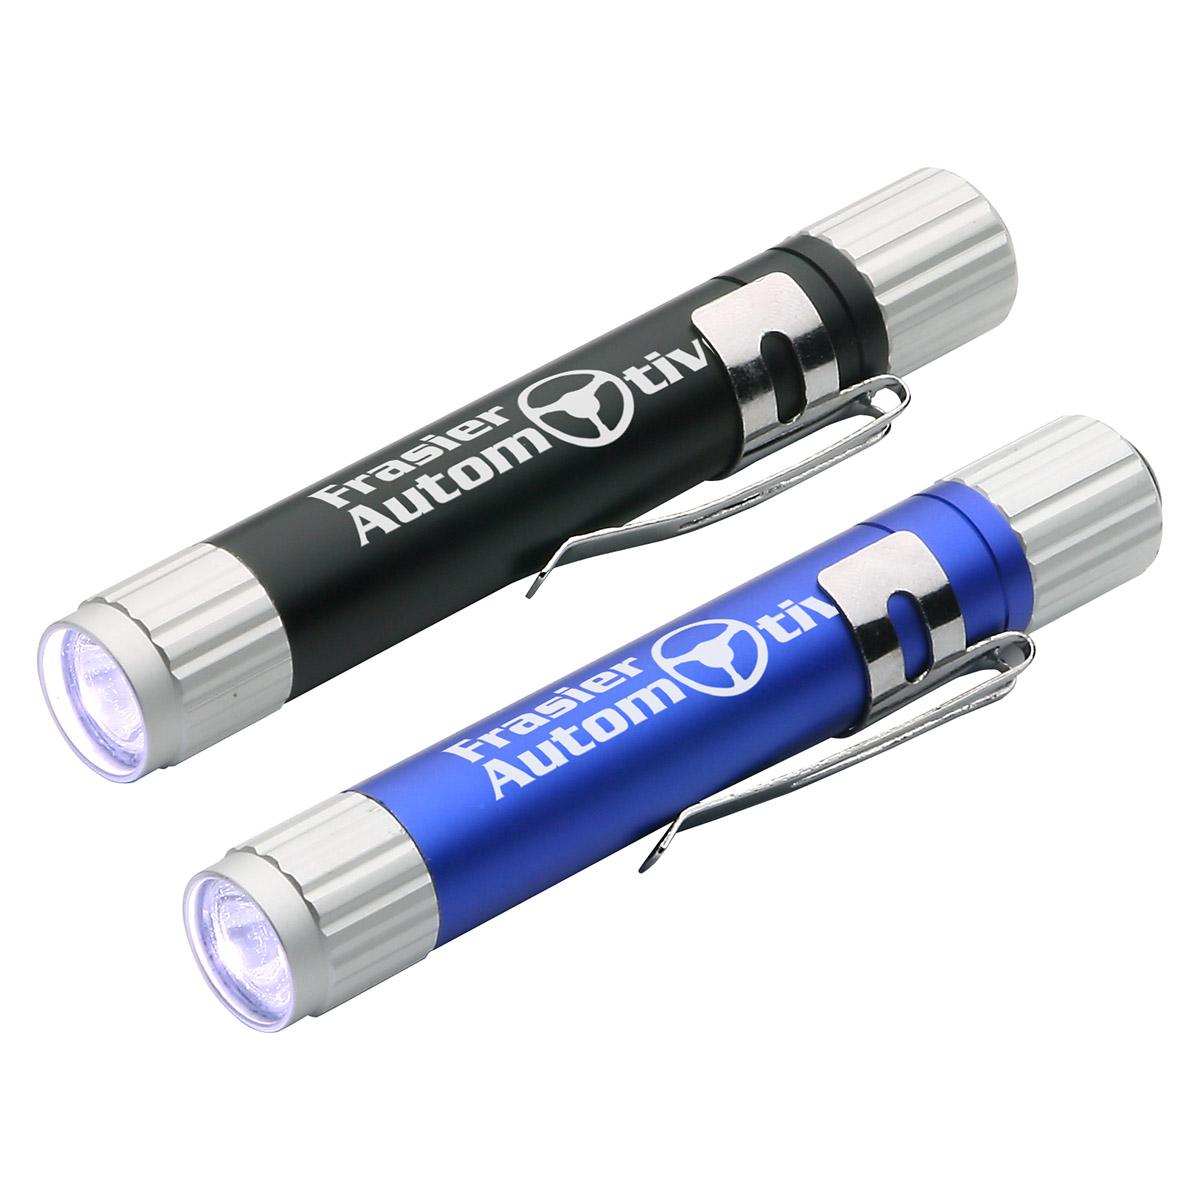 Aluminum LED Pen Light, WLT-AL11 - 1 Colour Imprint